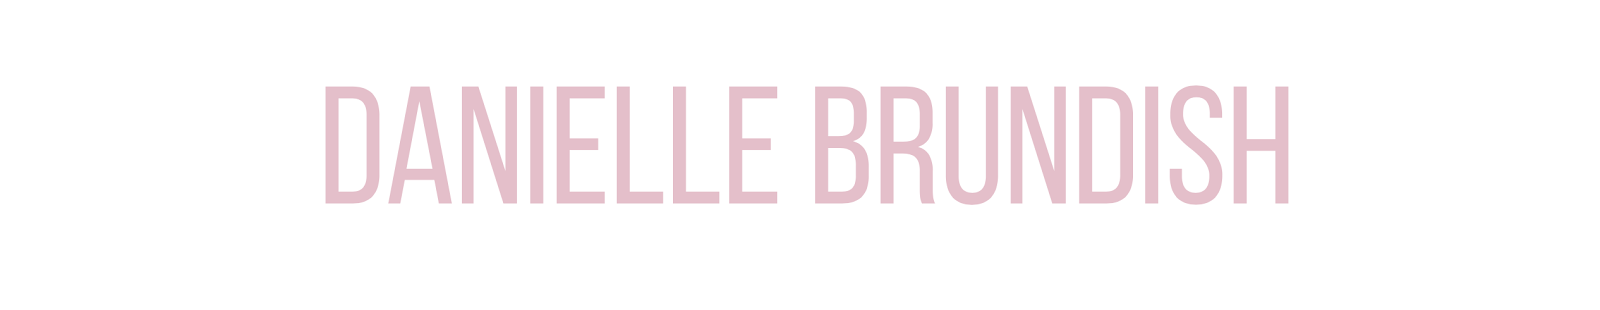 Danielle Brundish